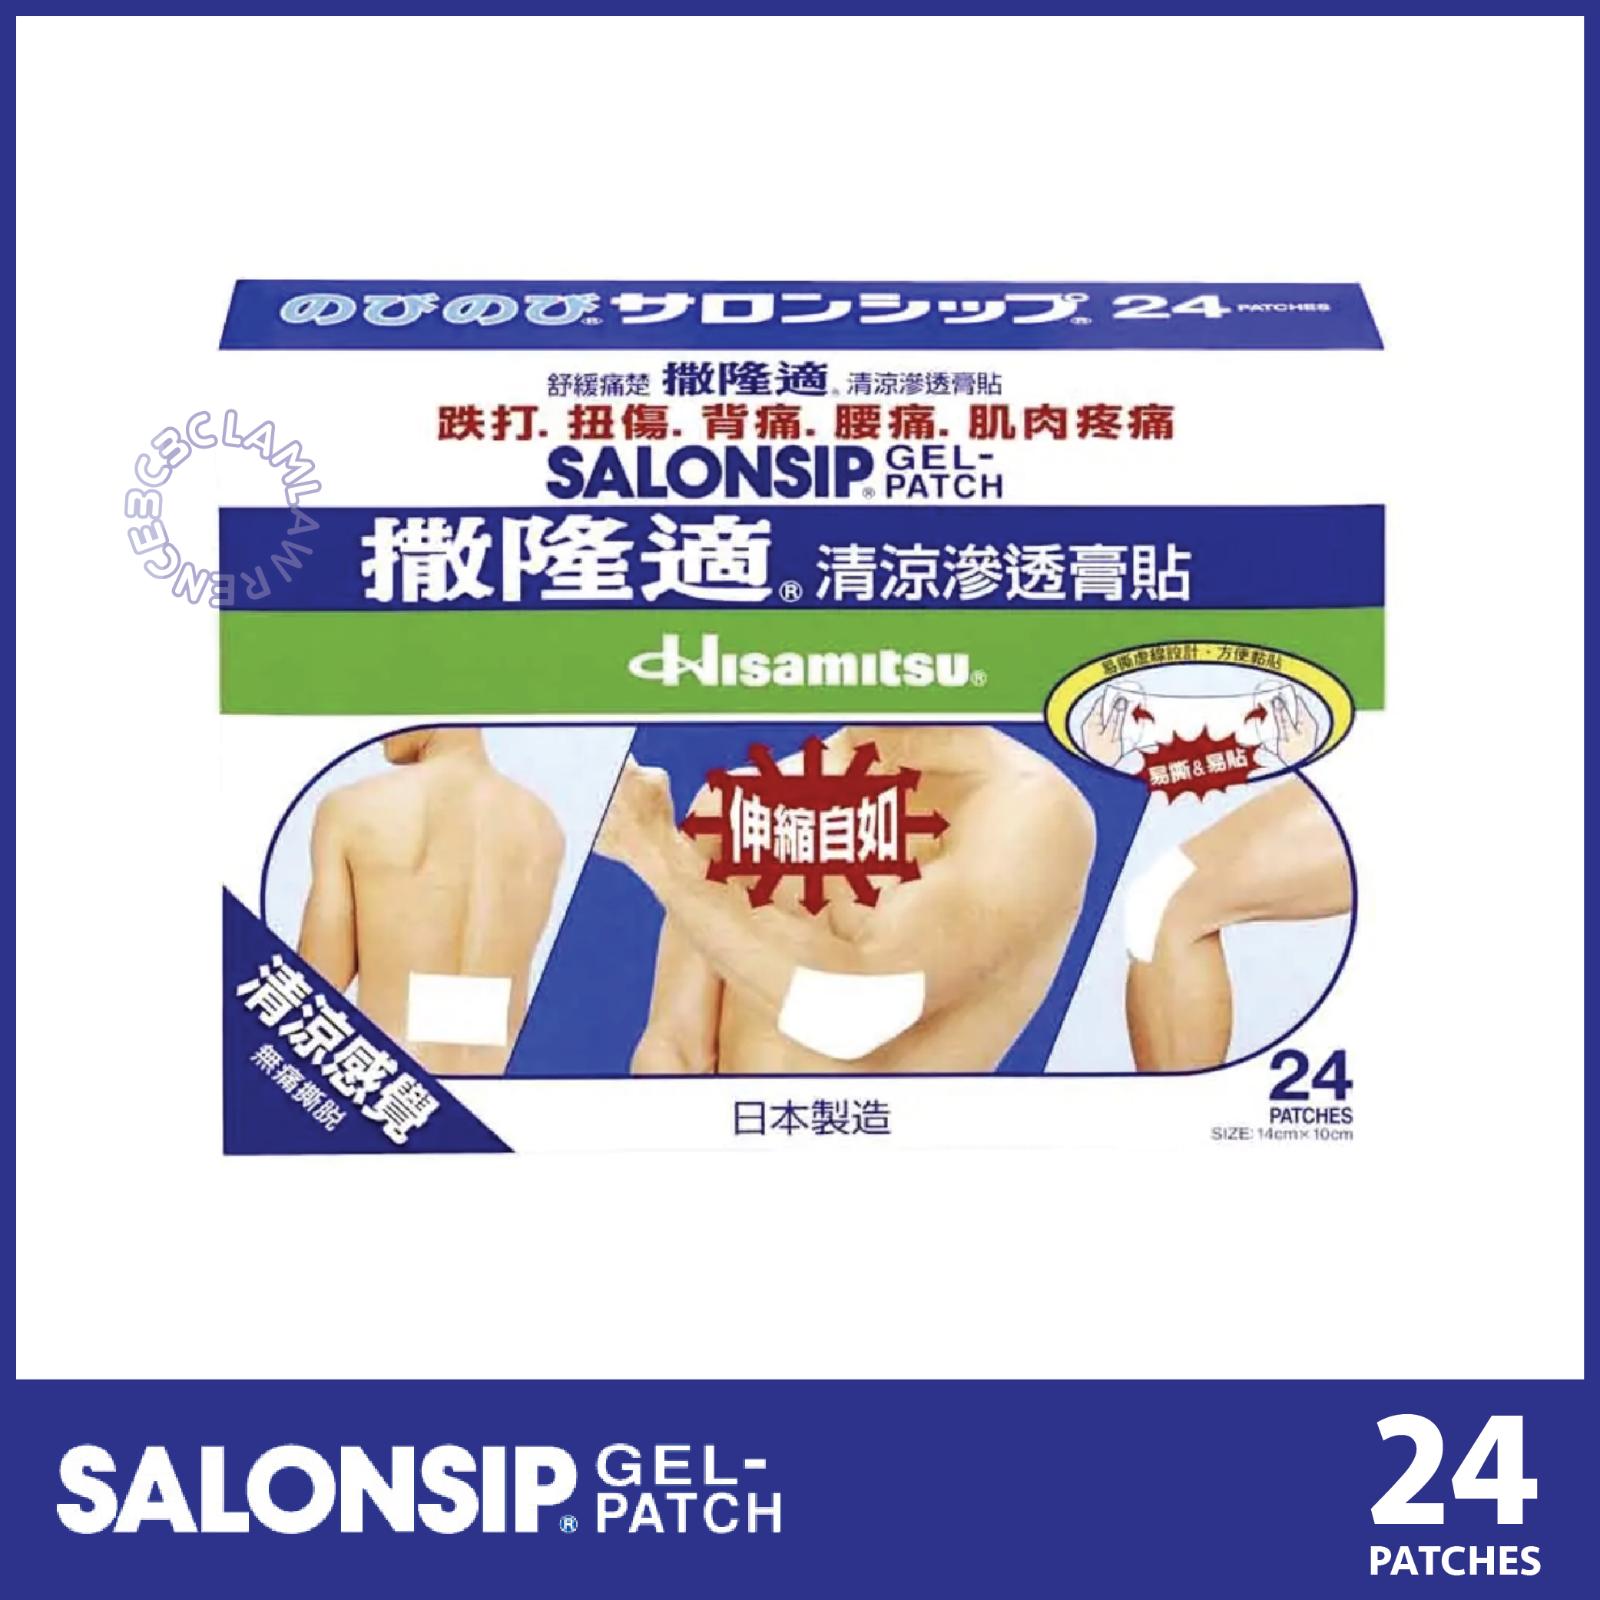 24 Patches SALONSIP 撒隆適 GEL-PATCH 14cm x 10cm Pain Relief Salonpas Hisamitsu